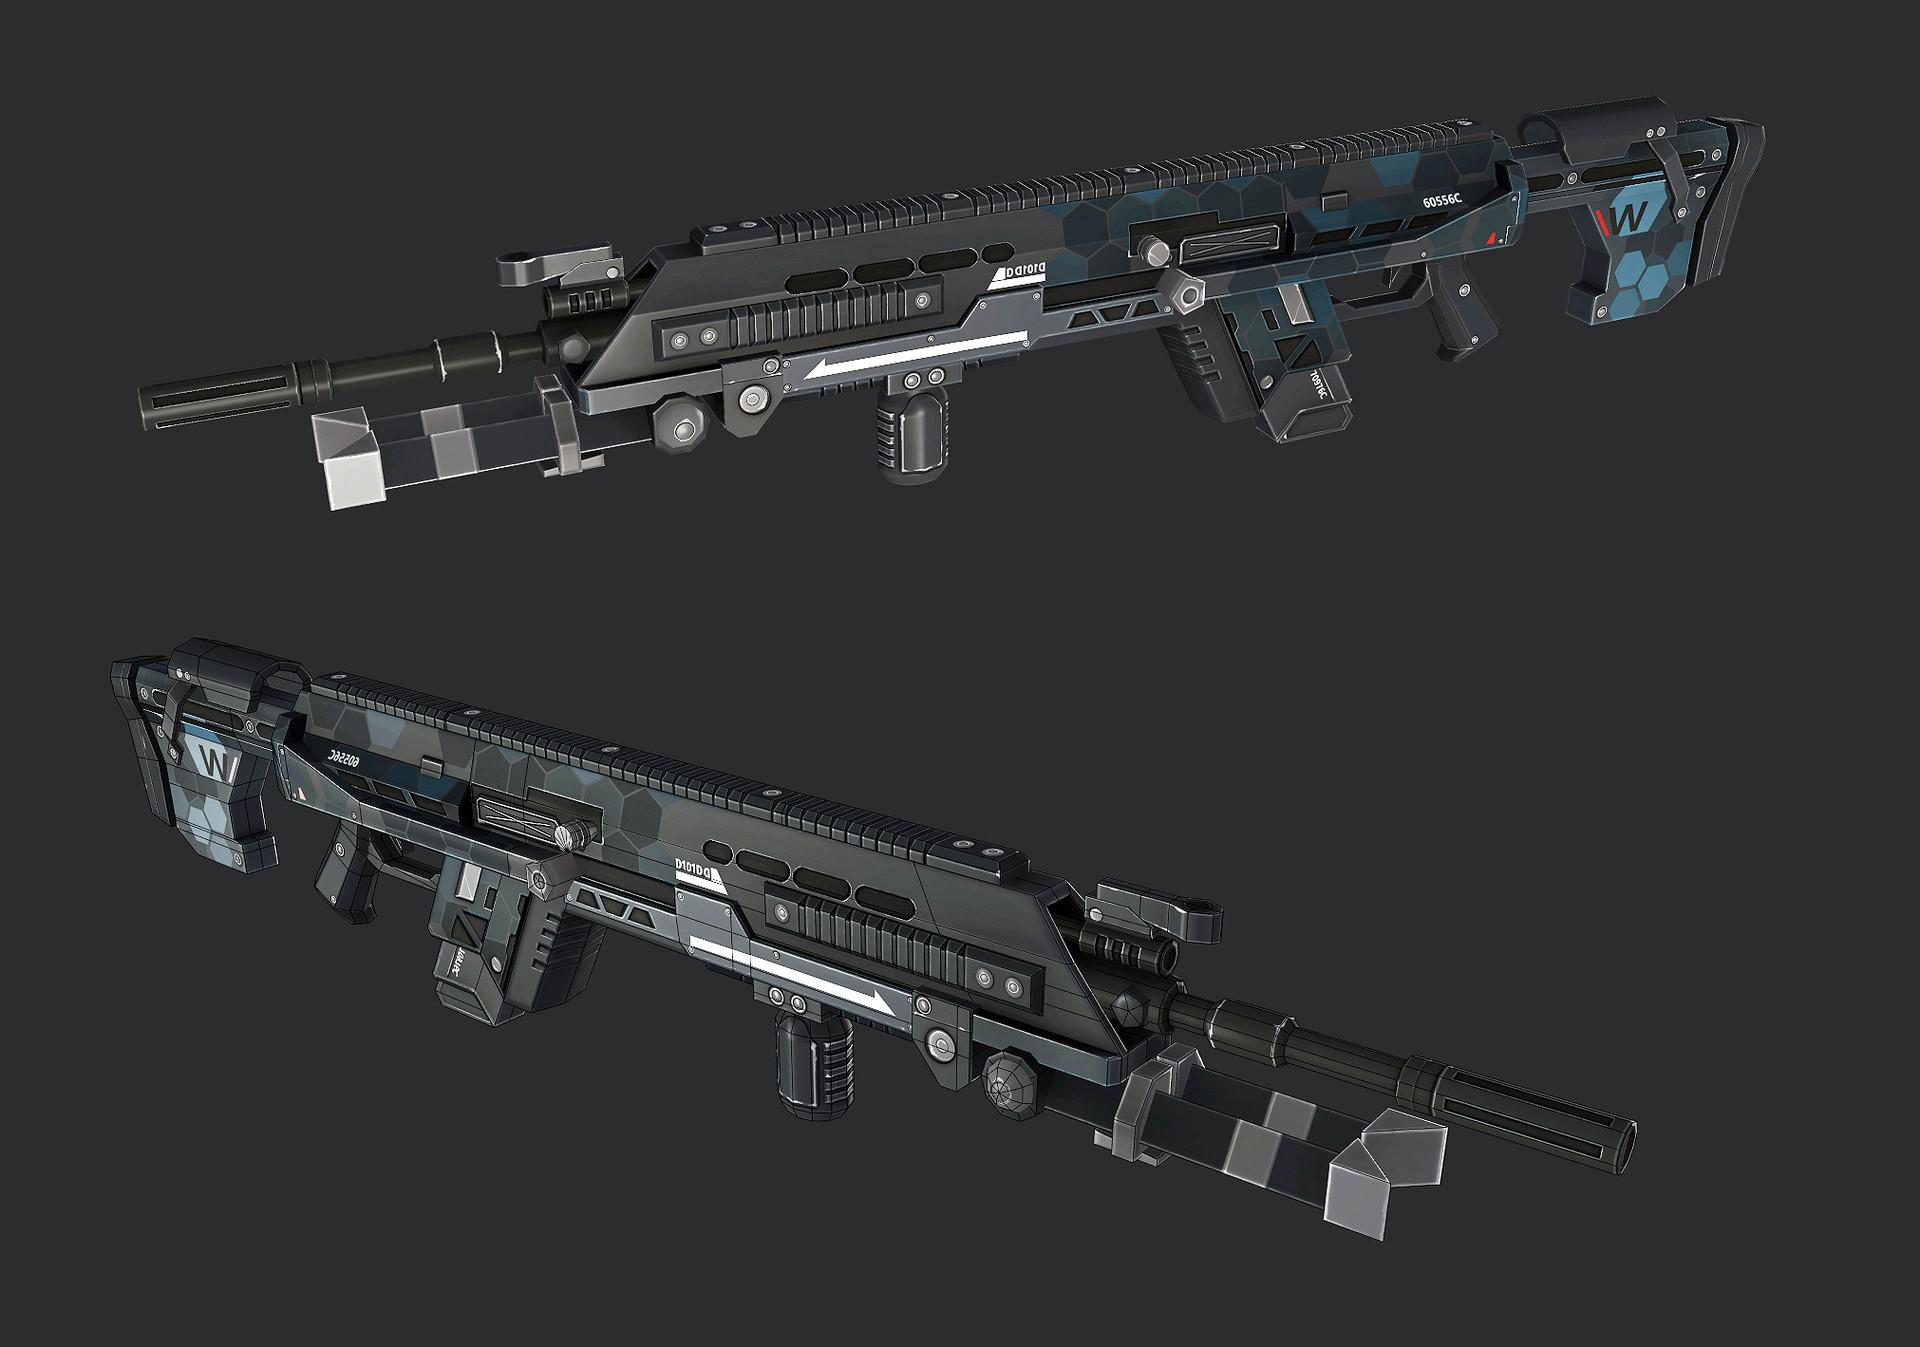 titanfall weapons minecraft mod - HD1920×1347